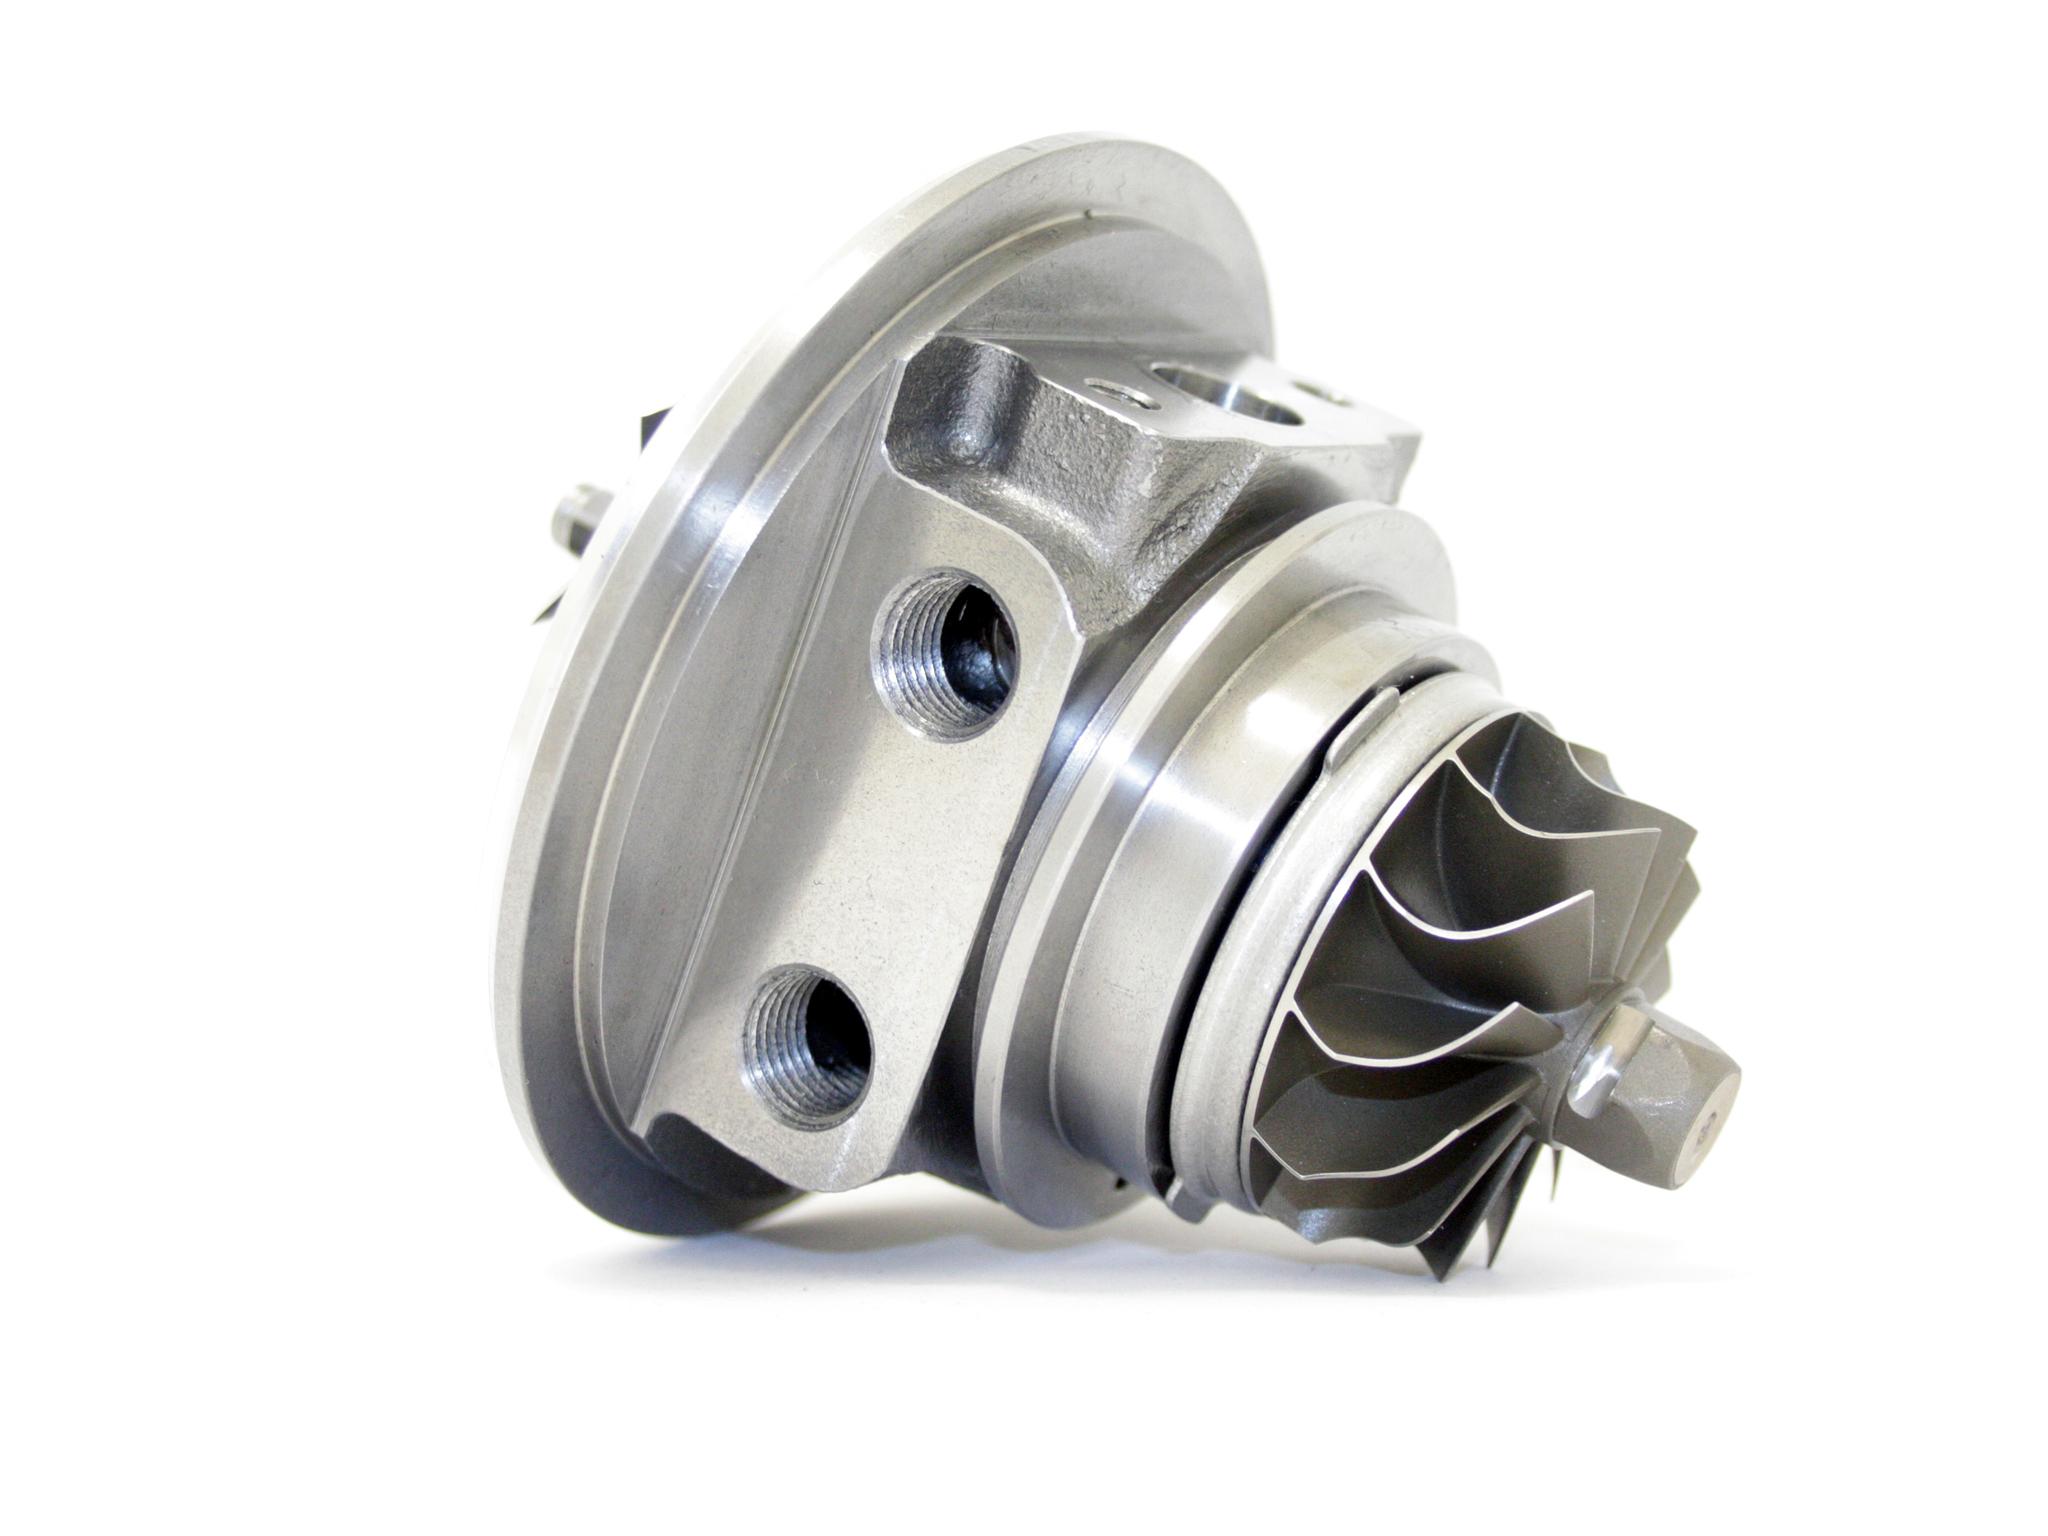 Картридж турбины K04 Форд 2.5 Экобуст 200 / 220 / 225 л.с.